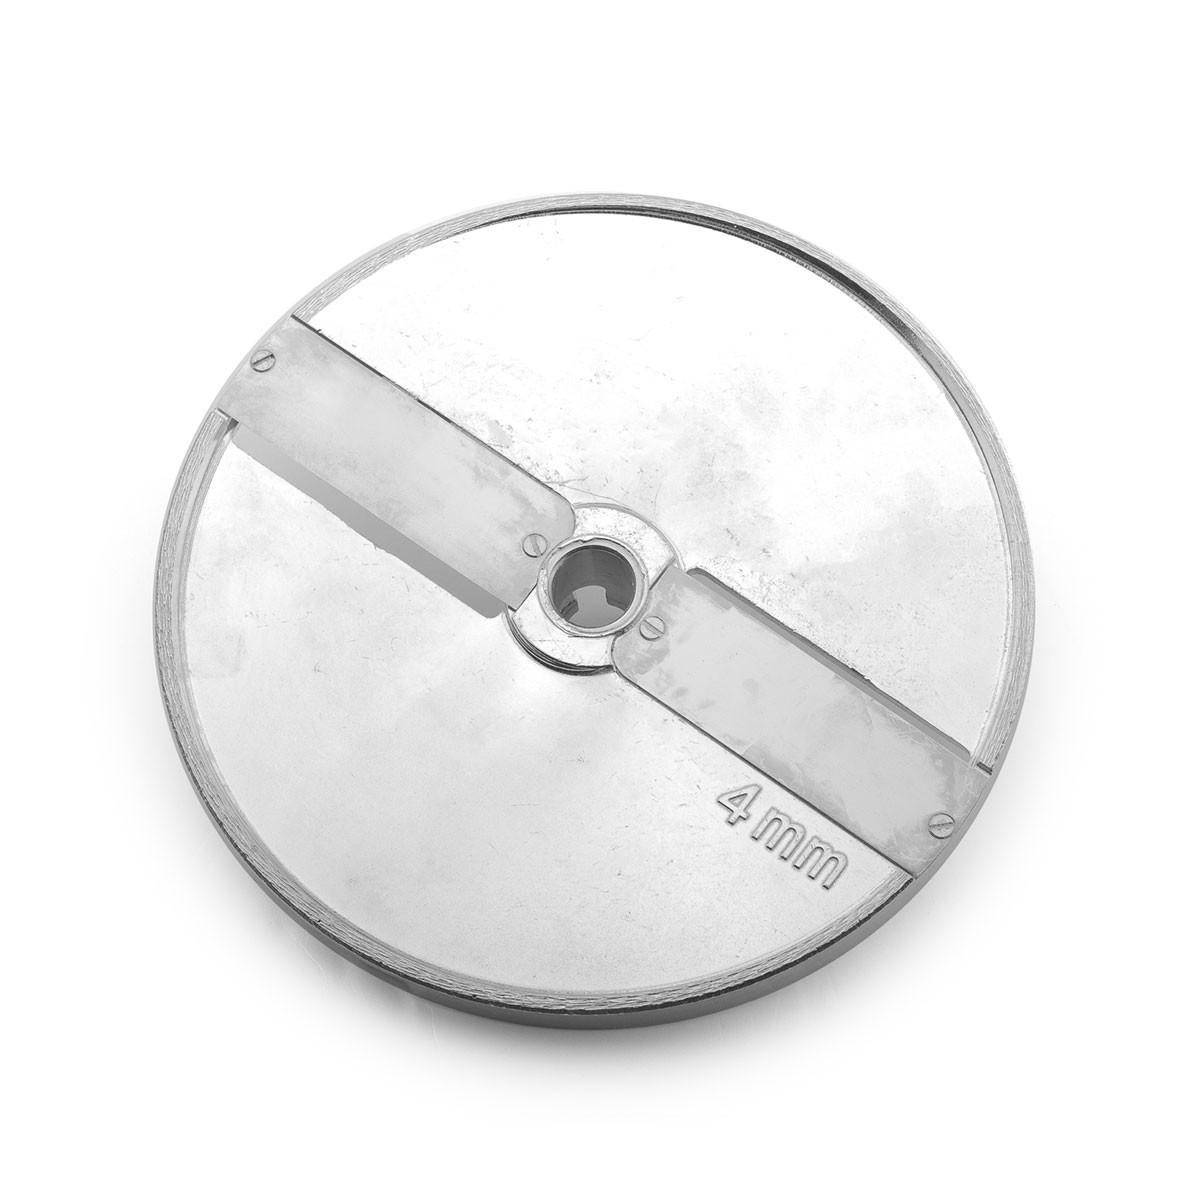 Schneidescheibe AS004 aus Aluminium - 4 mm Saro